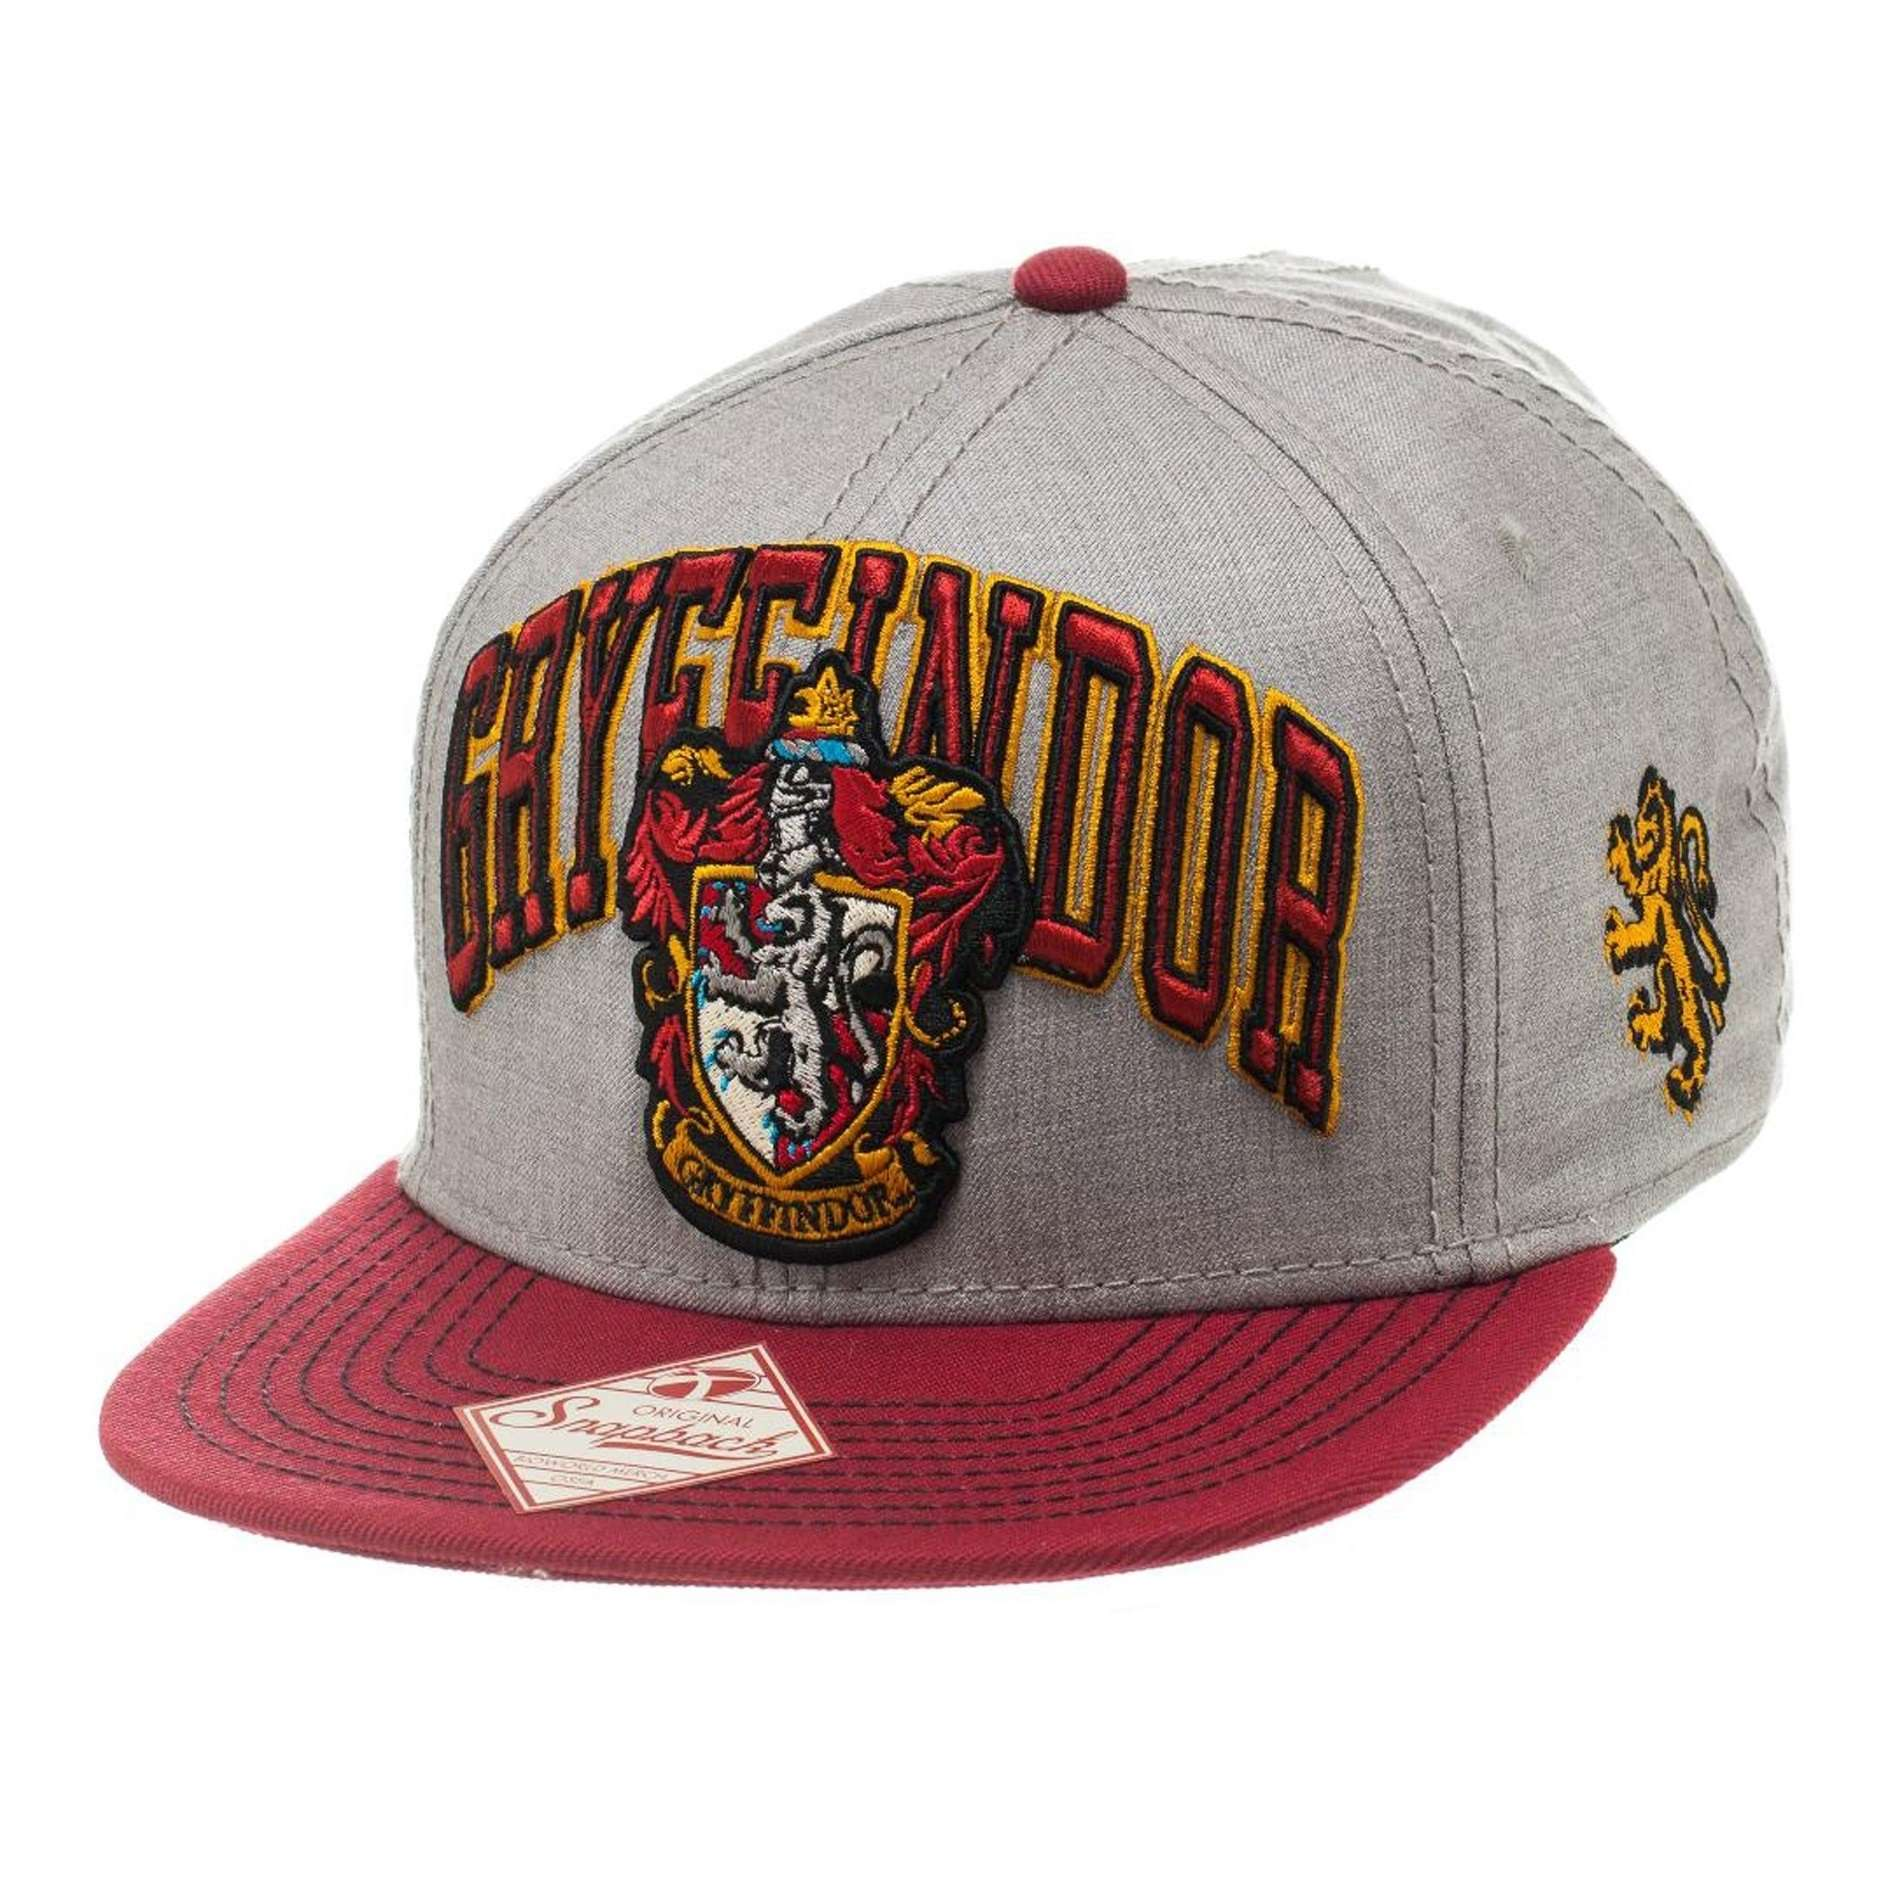 Hat: Harry Potter - Gryffindor Photo